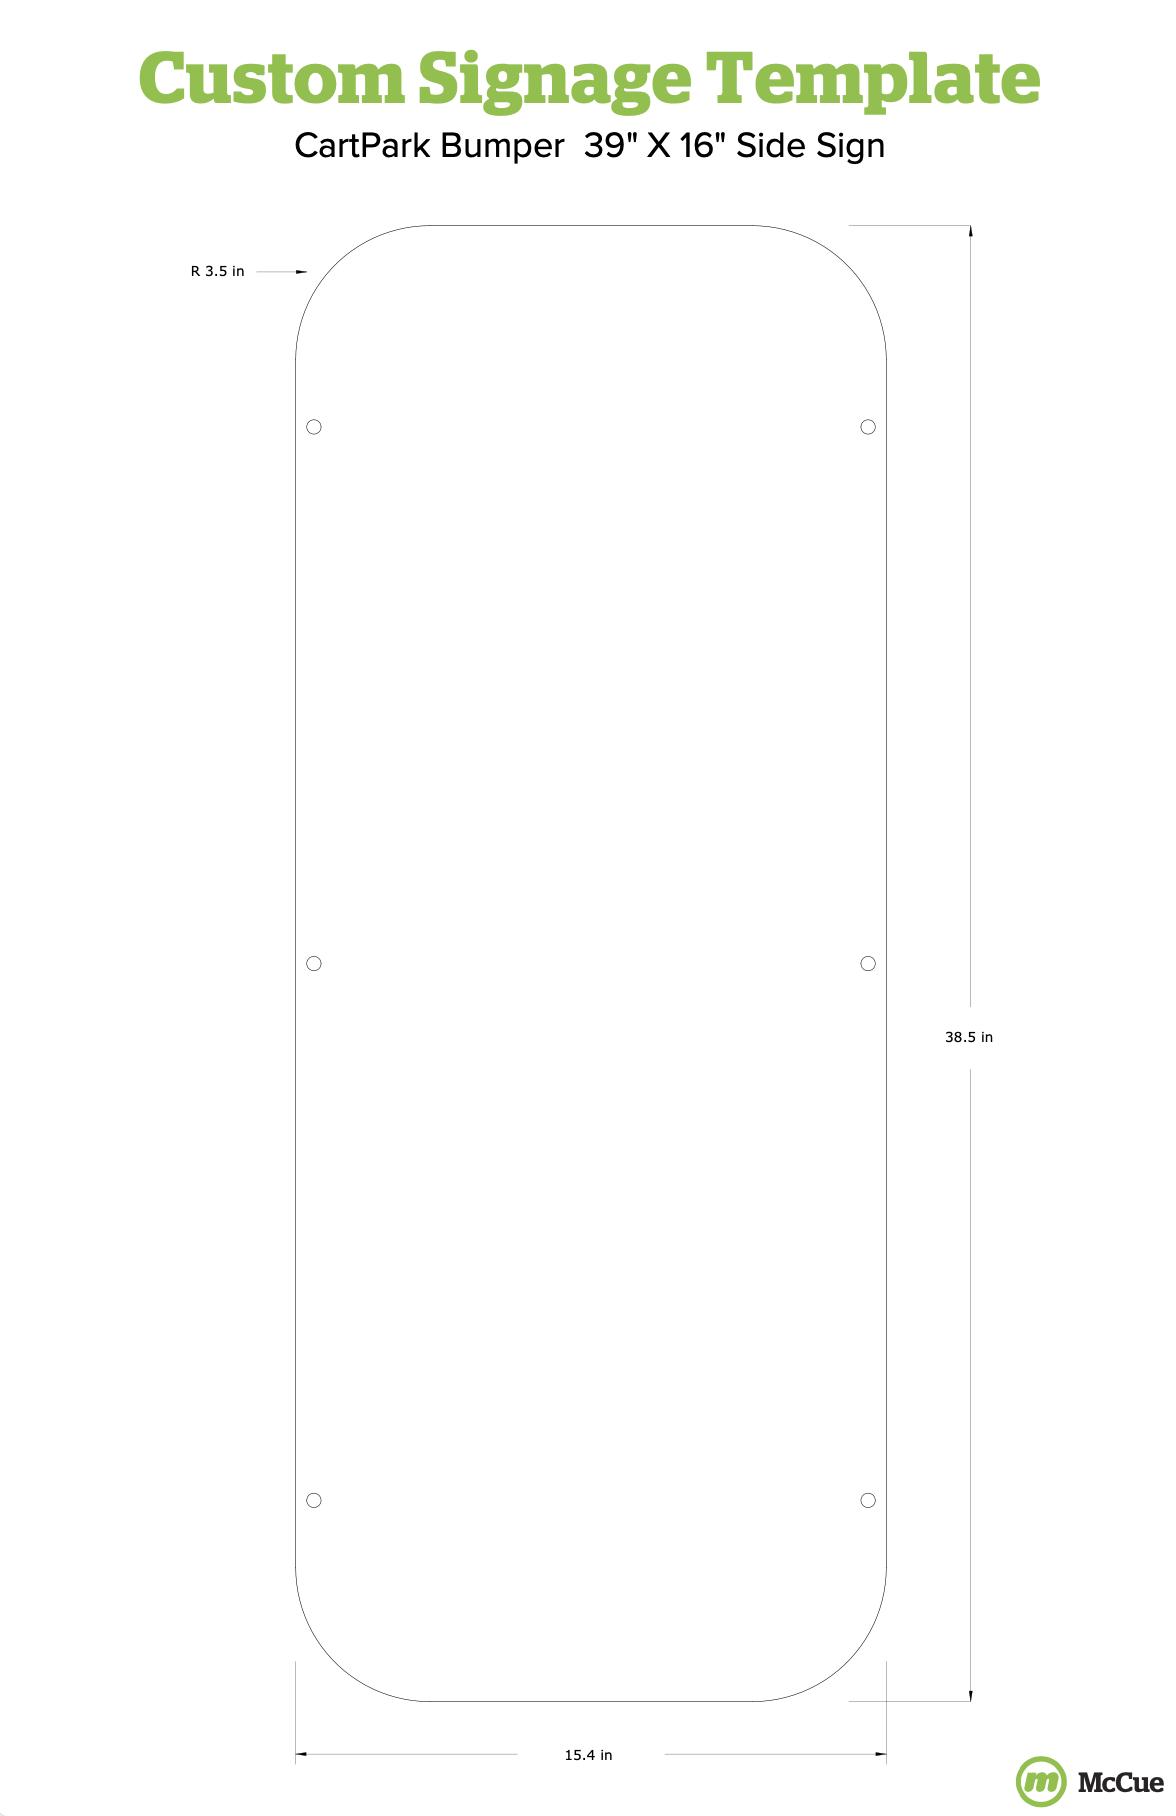 Rectangular Side Sign Template for CartPark Bumper